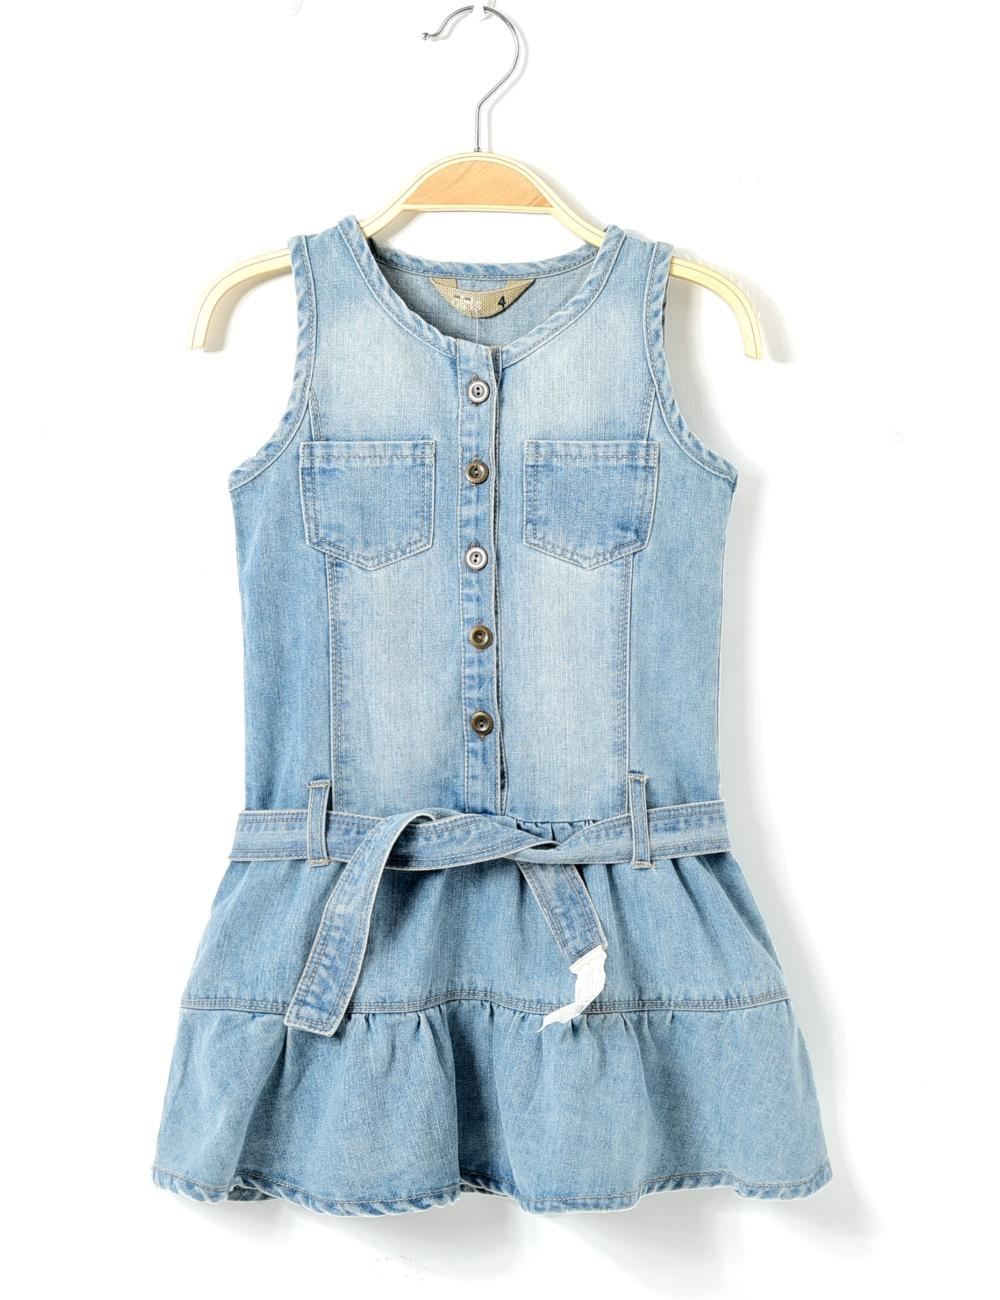 2016 spring summer brand style infant girl denim one-piece dress kids sleeveless catimini children jeans with belt 2 3 4 5 6 7T(China (Mainland))